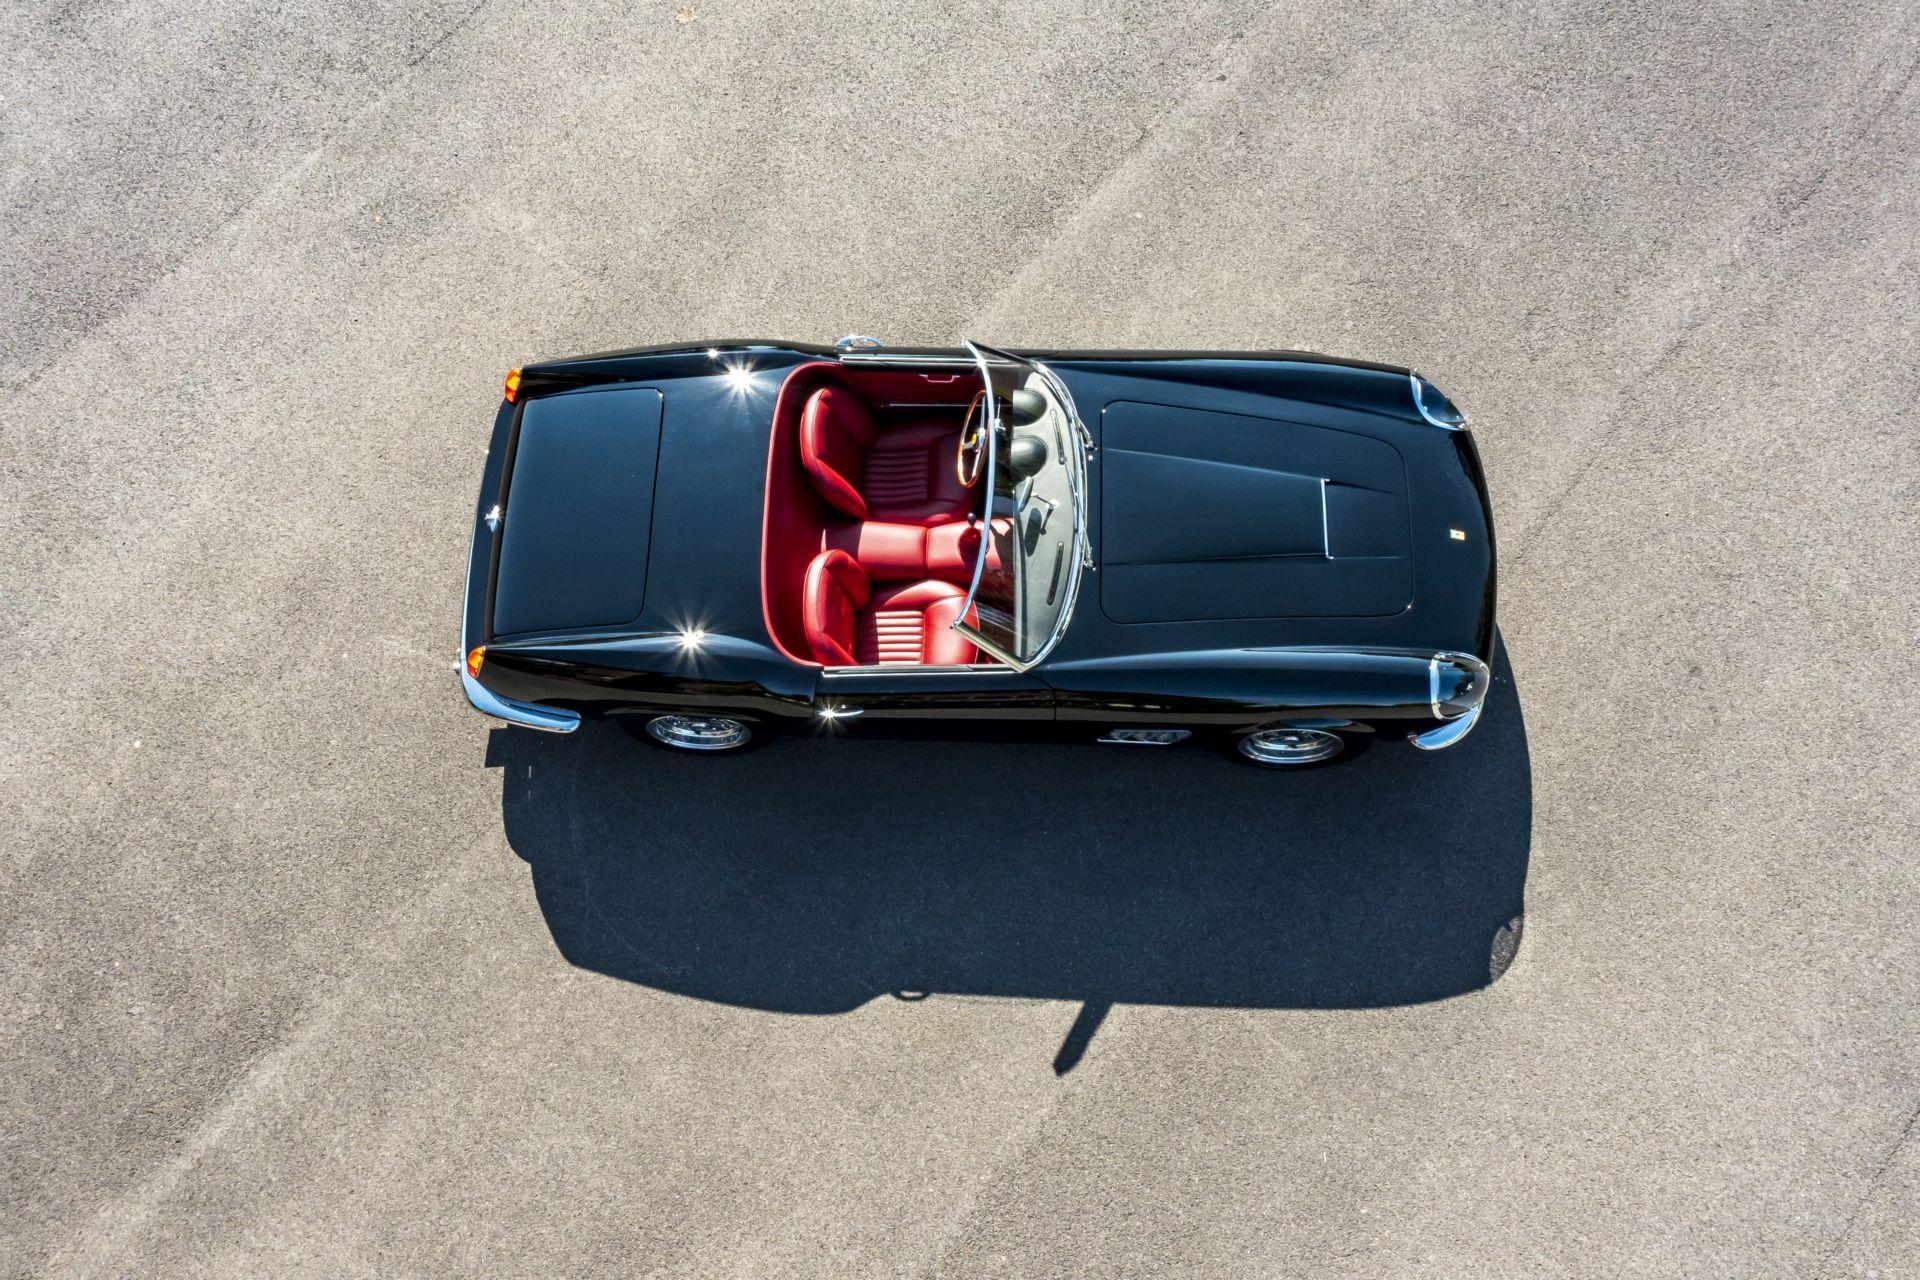 Ferrari-California-Spyder-by-GTO-Engineering-8